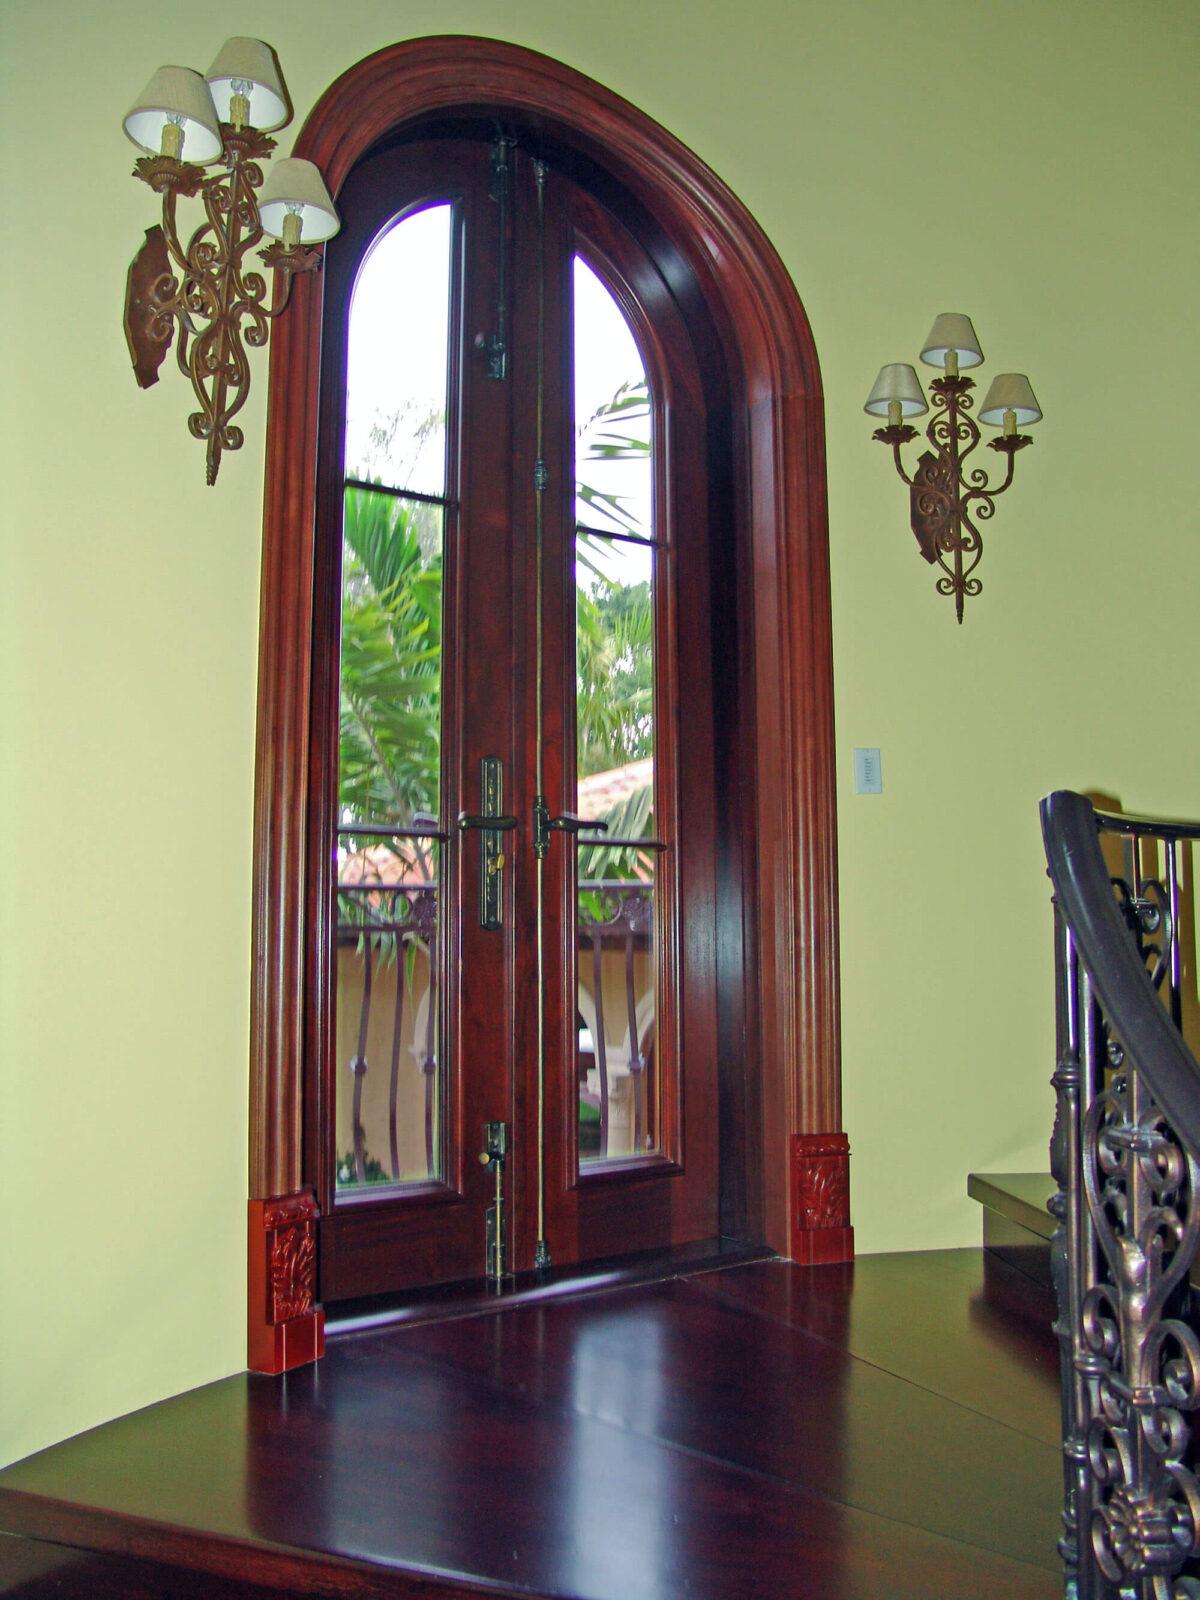 JUPITER BALCONY MAHOGANY DOOR INTERIOR